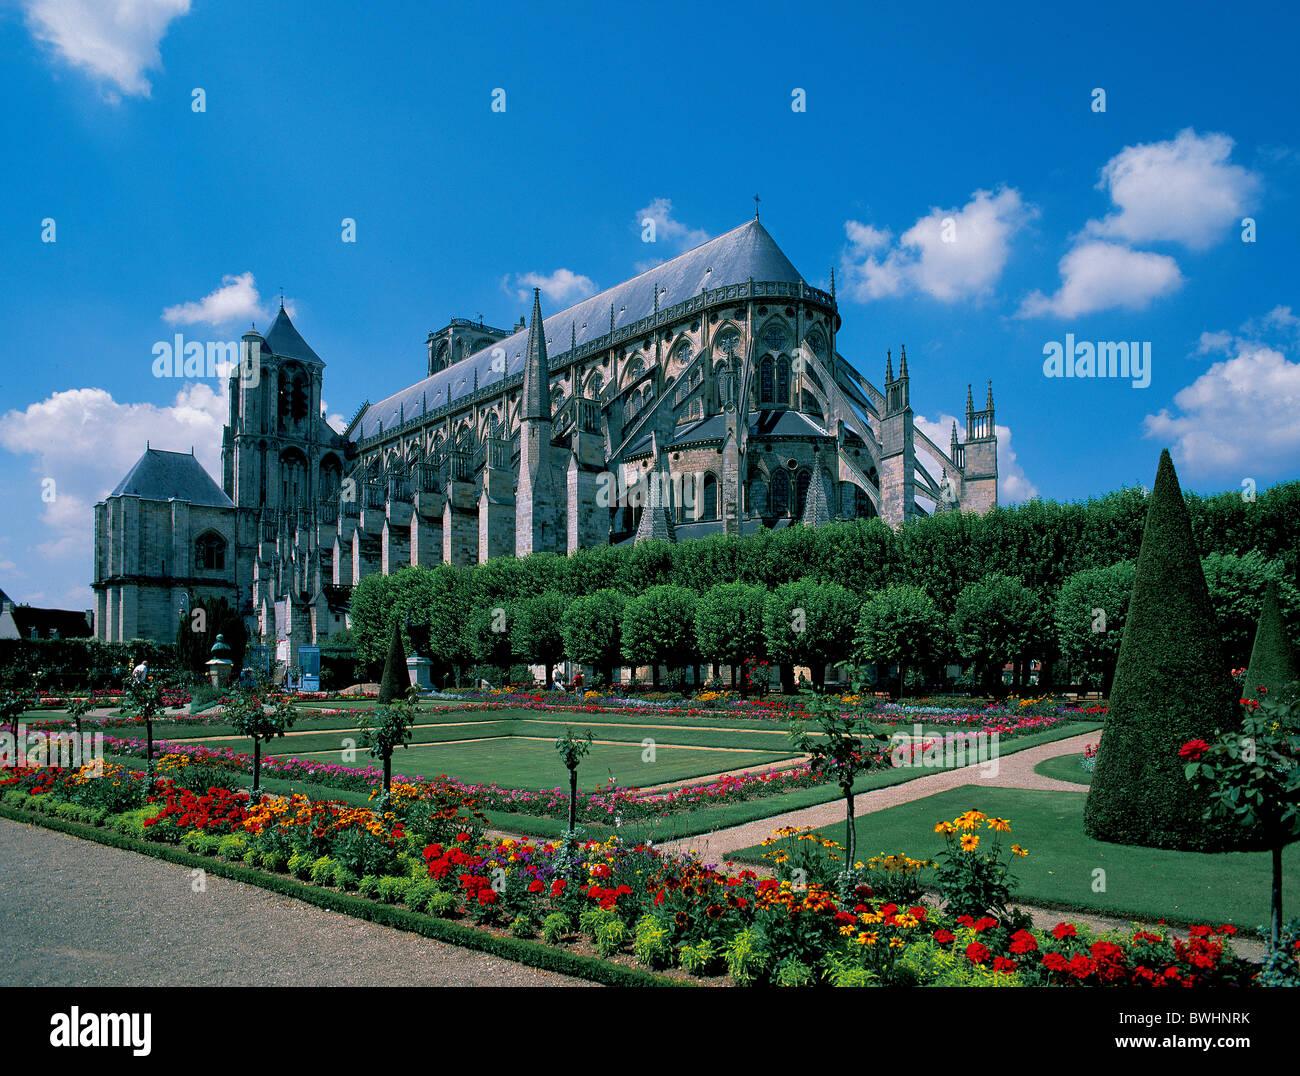 Francia Europa departamento Cher Bourges catedral Saint-Etienne patrimonio cultural mundial de la UNESCO garden Imagen De Stock